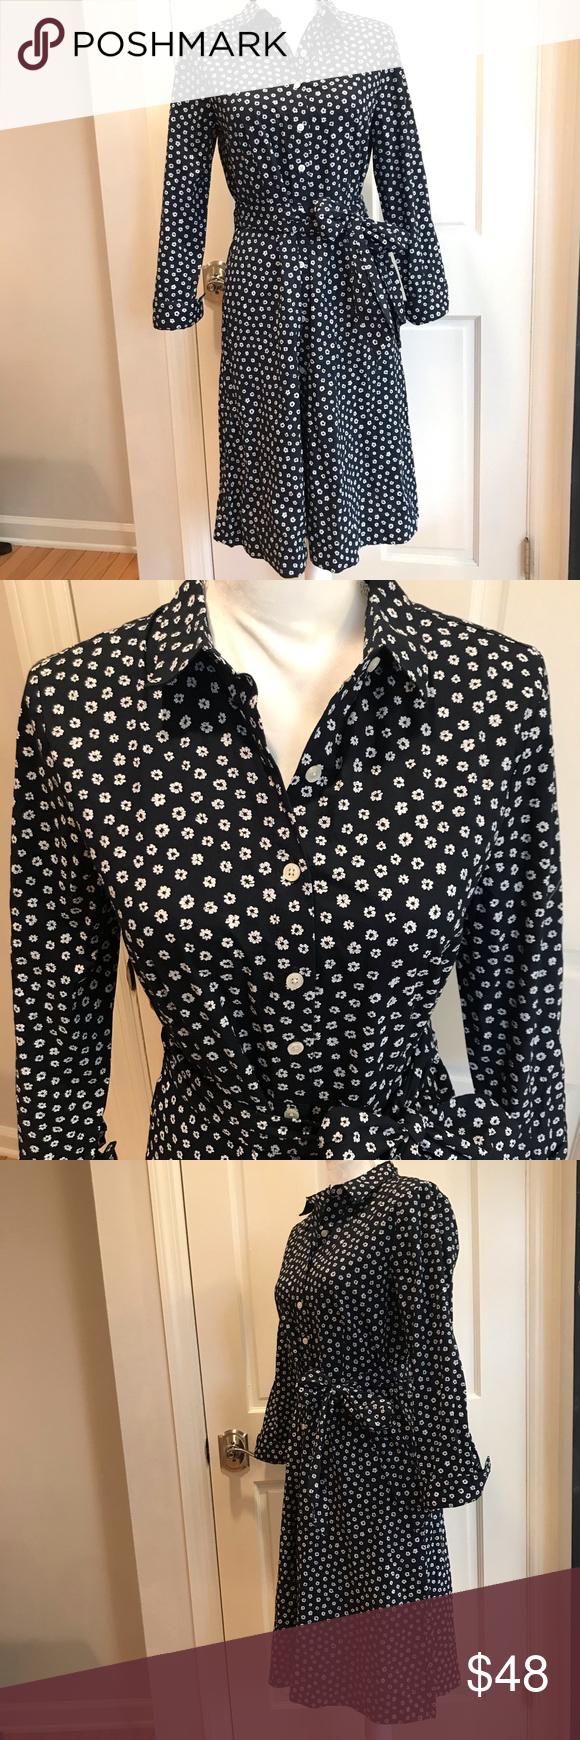 Nwt J Crew Long Sleeve Button Down Shirt Dress Button Down Shirt Dress Clothes Design Dress Brands [ 1740 x 580 Pixel ]